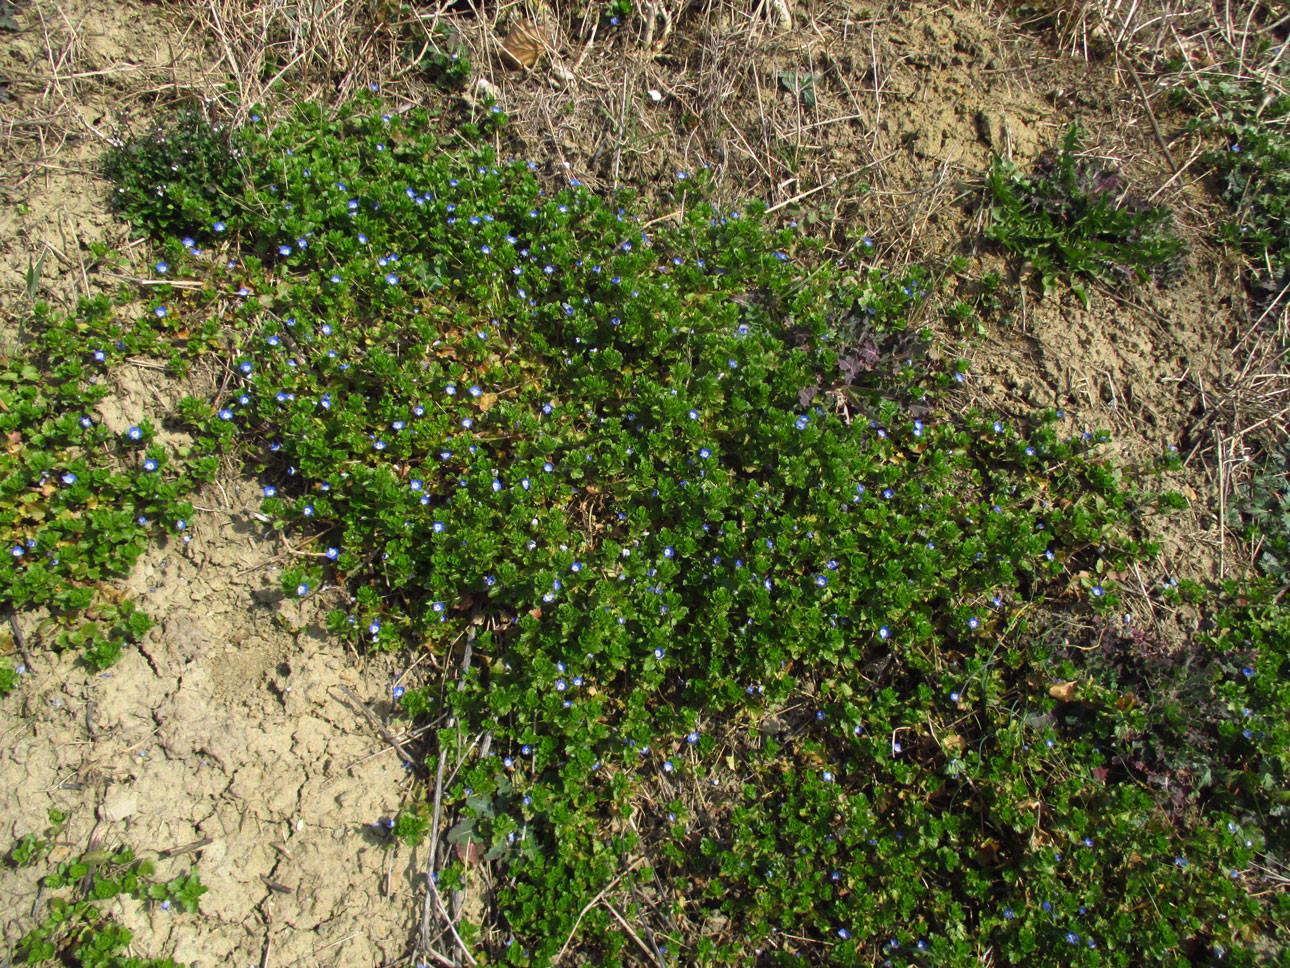 Persien-Ehrenpreis (Veronica persica) | Familie: Ehrenpreisgewächse (Veronicaceae)